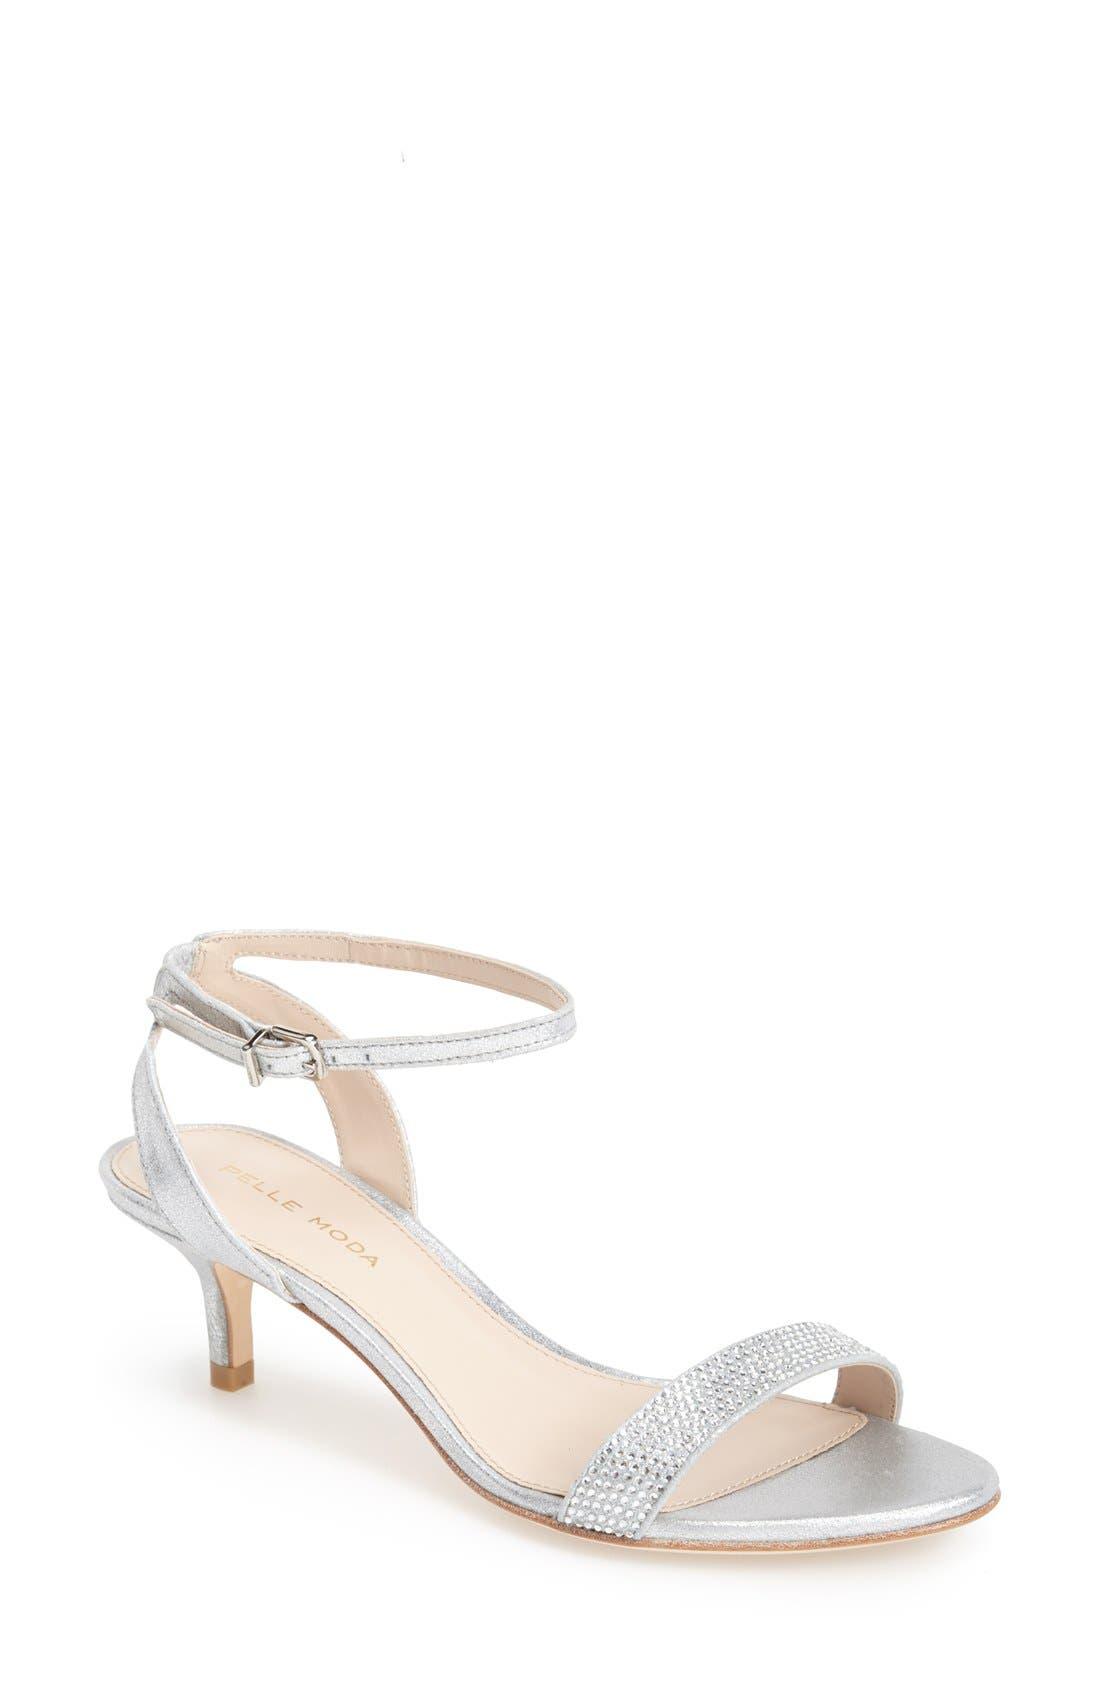 PELLE MODA 'Fabia' Sandal